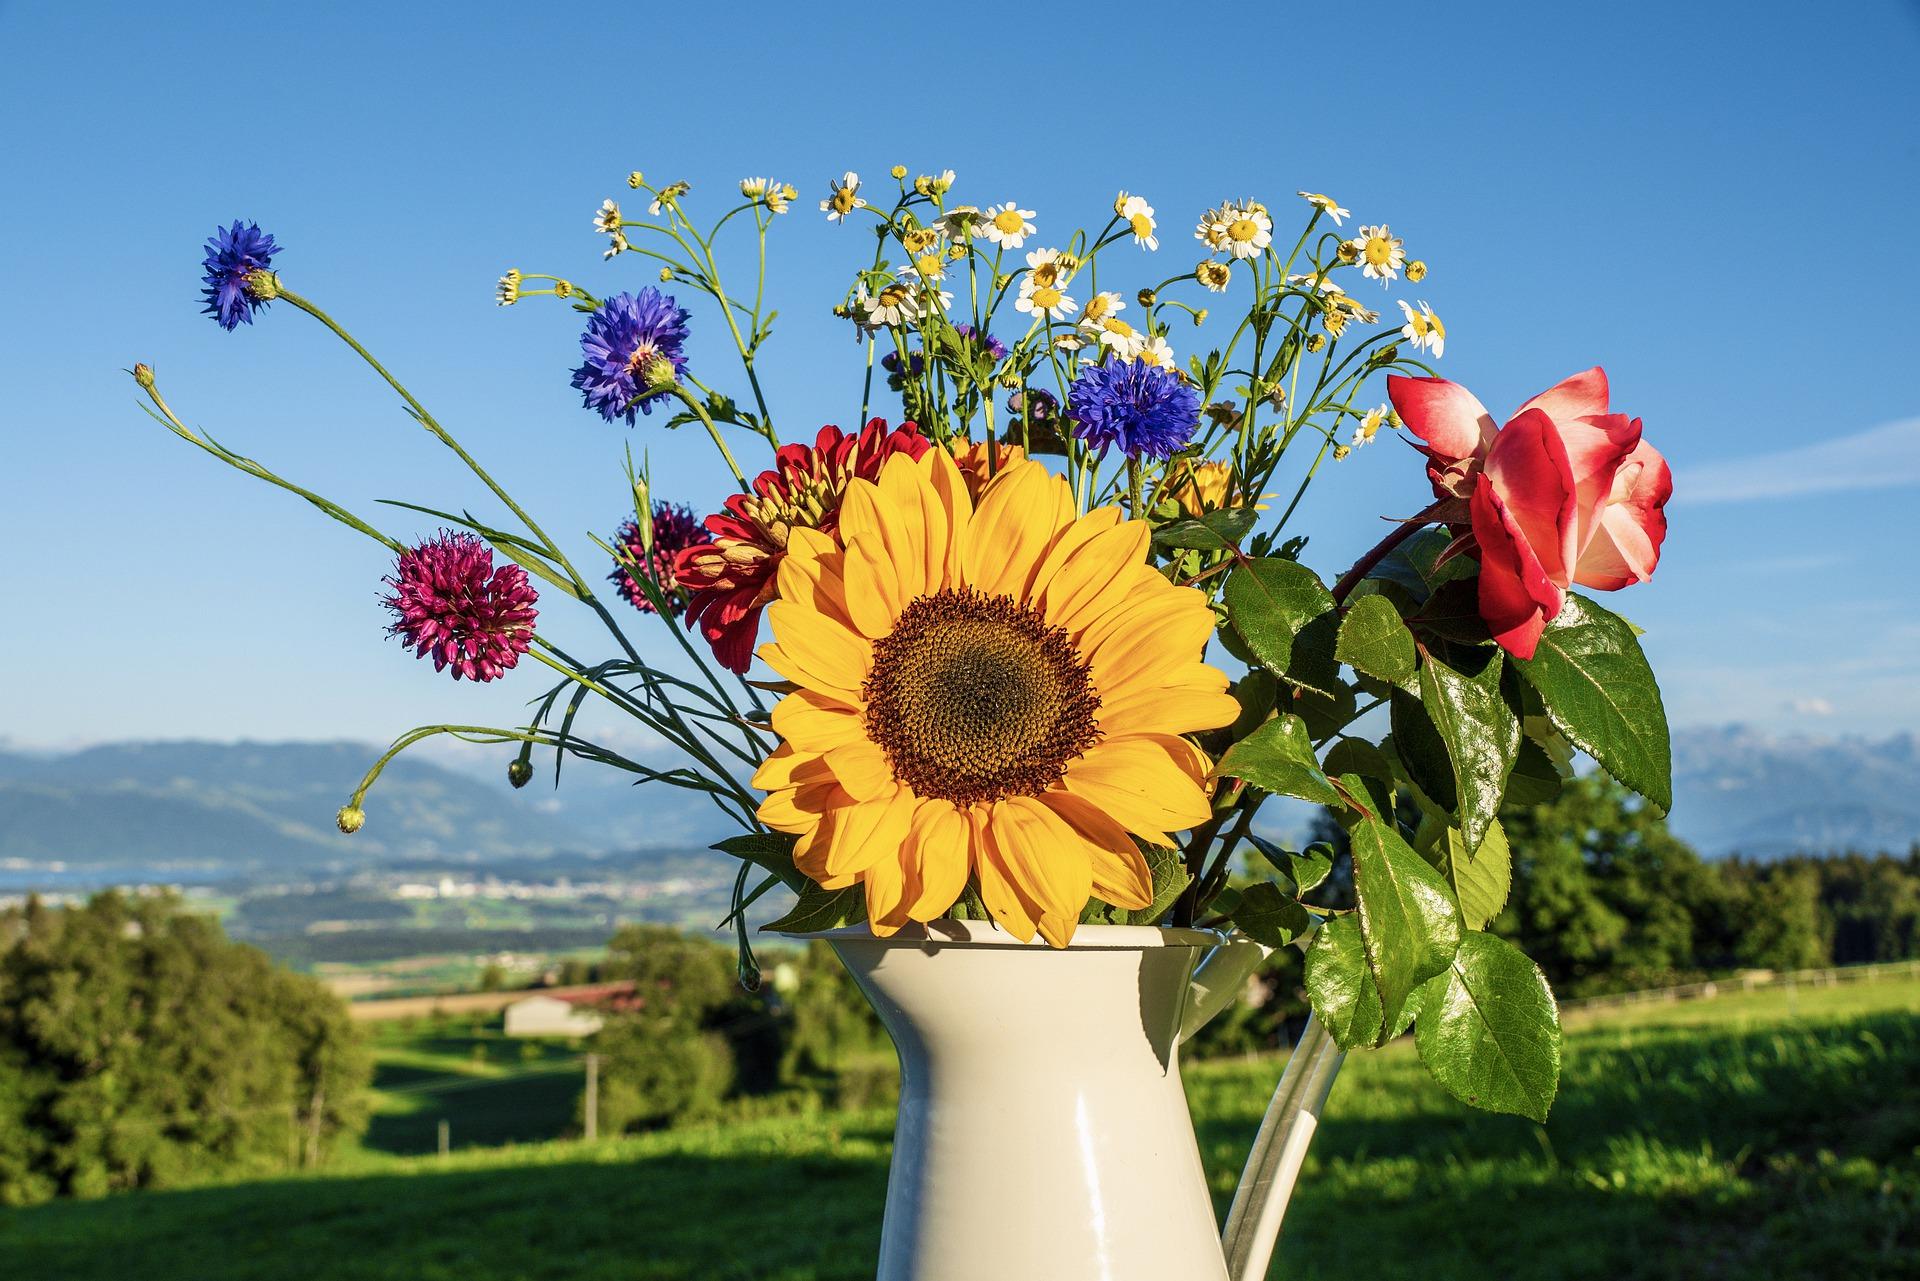 bouquet of flowers - sunflower